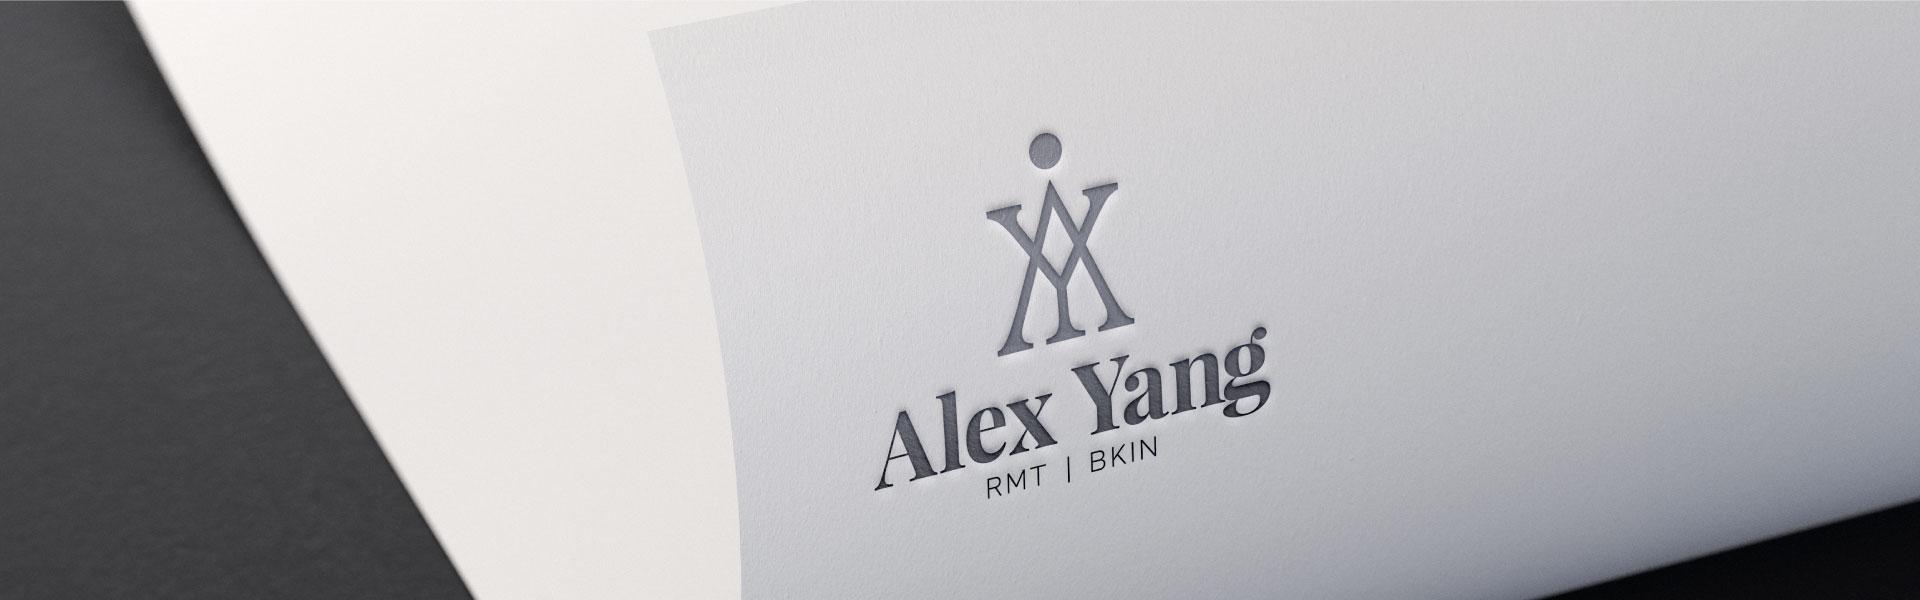 alex-yang-brand-logo-design-by-mapleweb-vancouver-canada-header-image